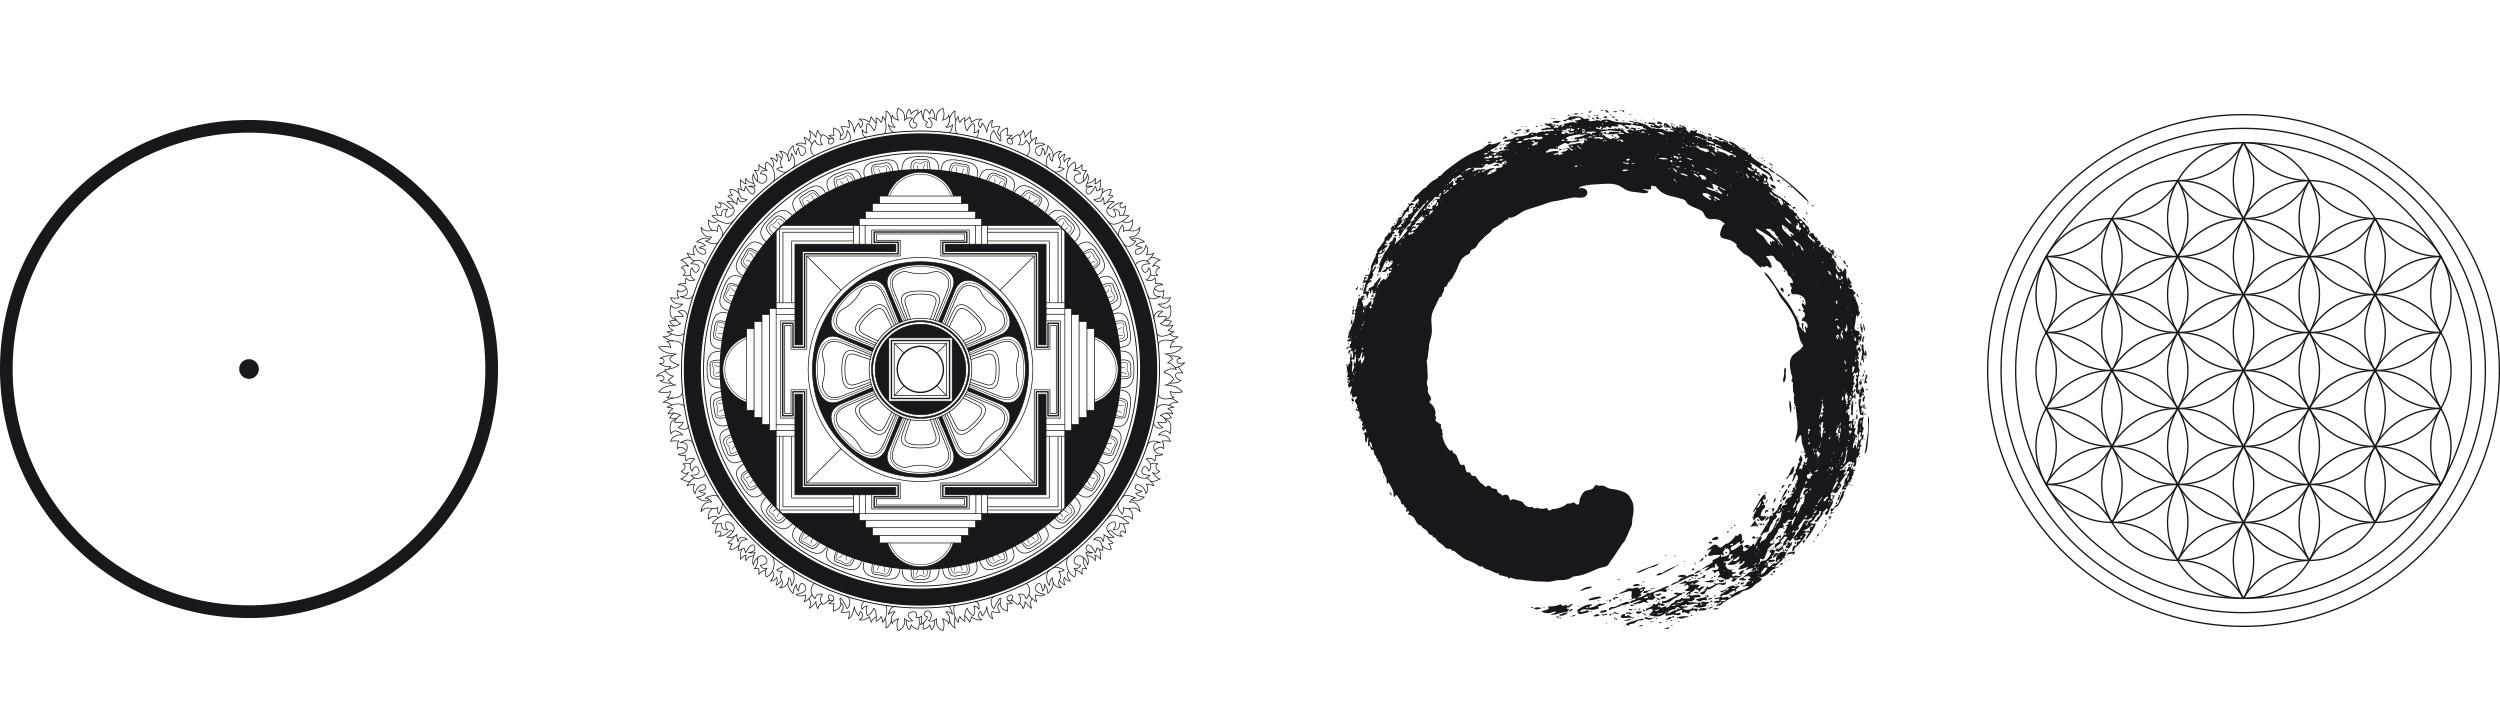 Circle, Kalachakra Mandala, Ensō, Flower Of Life